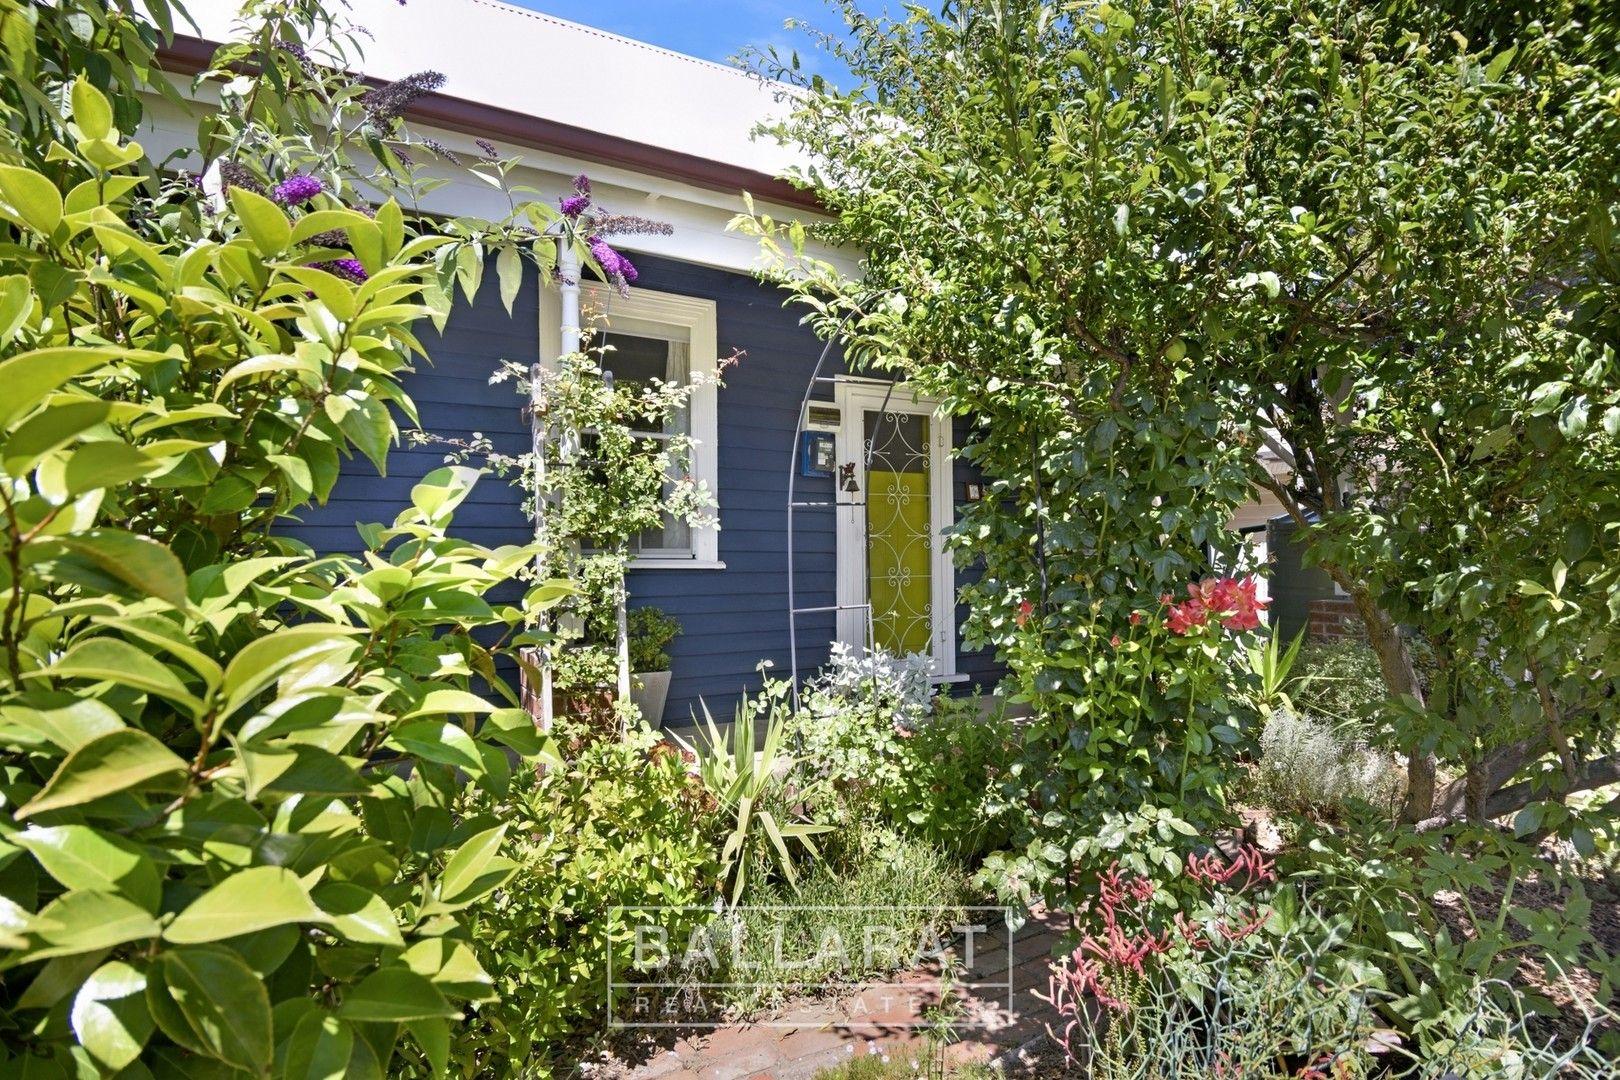 16 Baird Street, Ballarat Central VIC 3350, Image 0